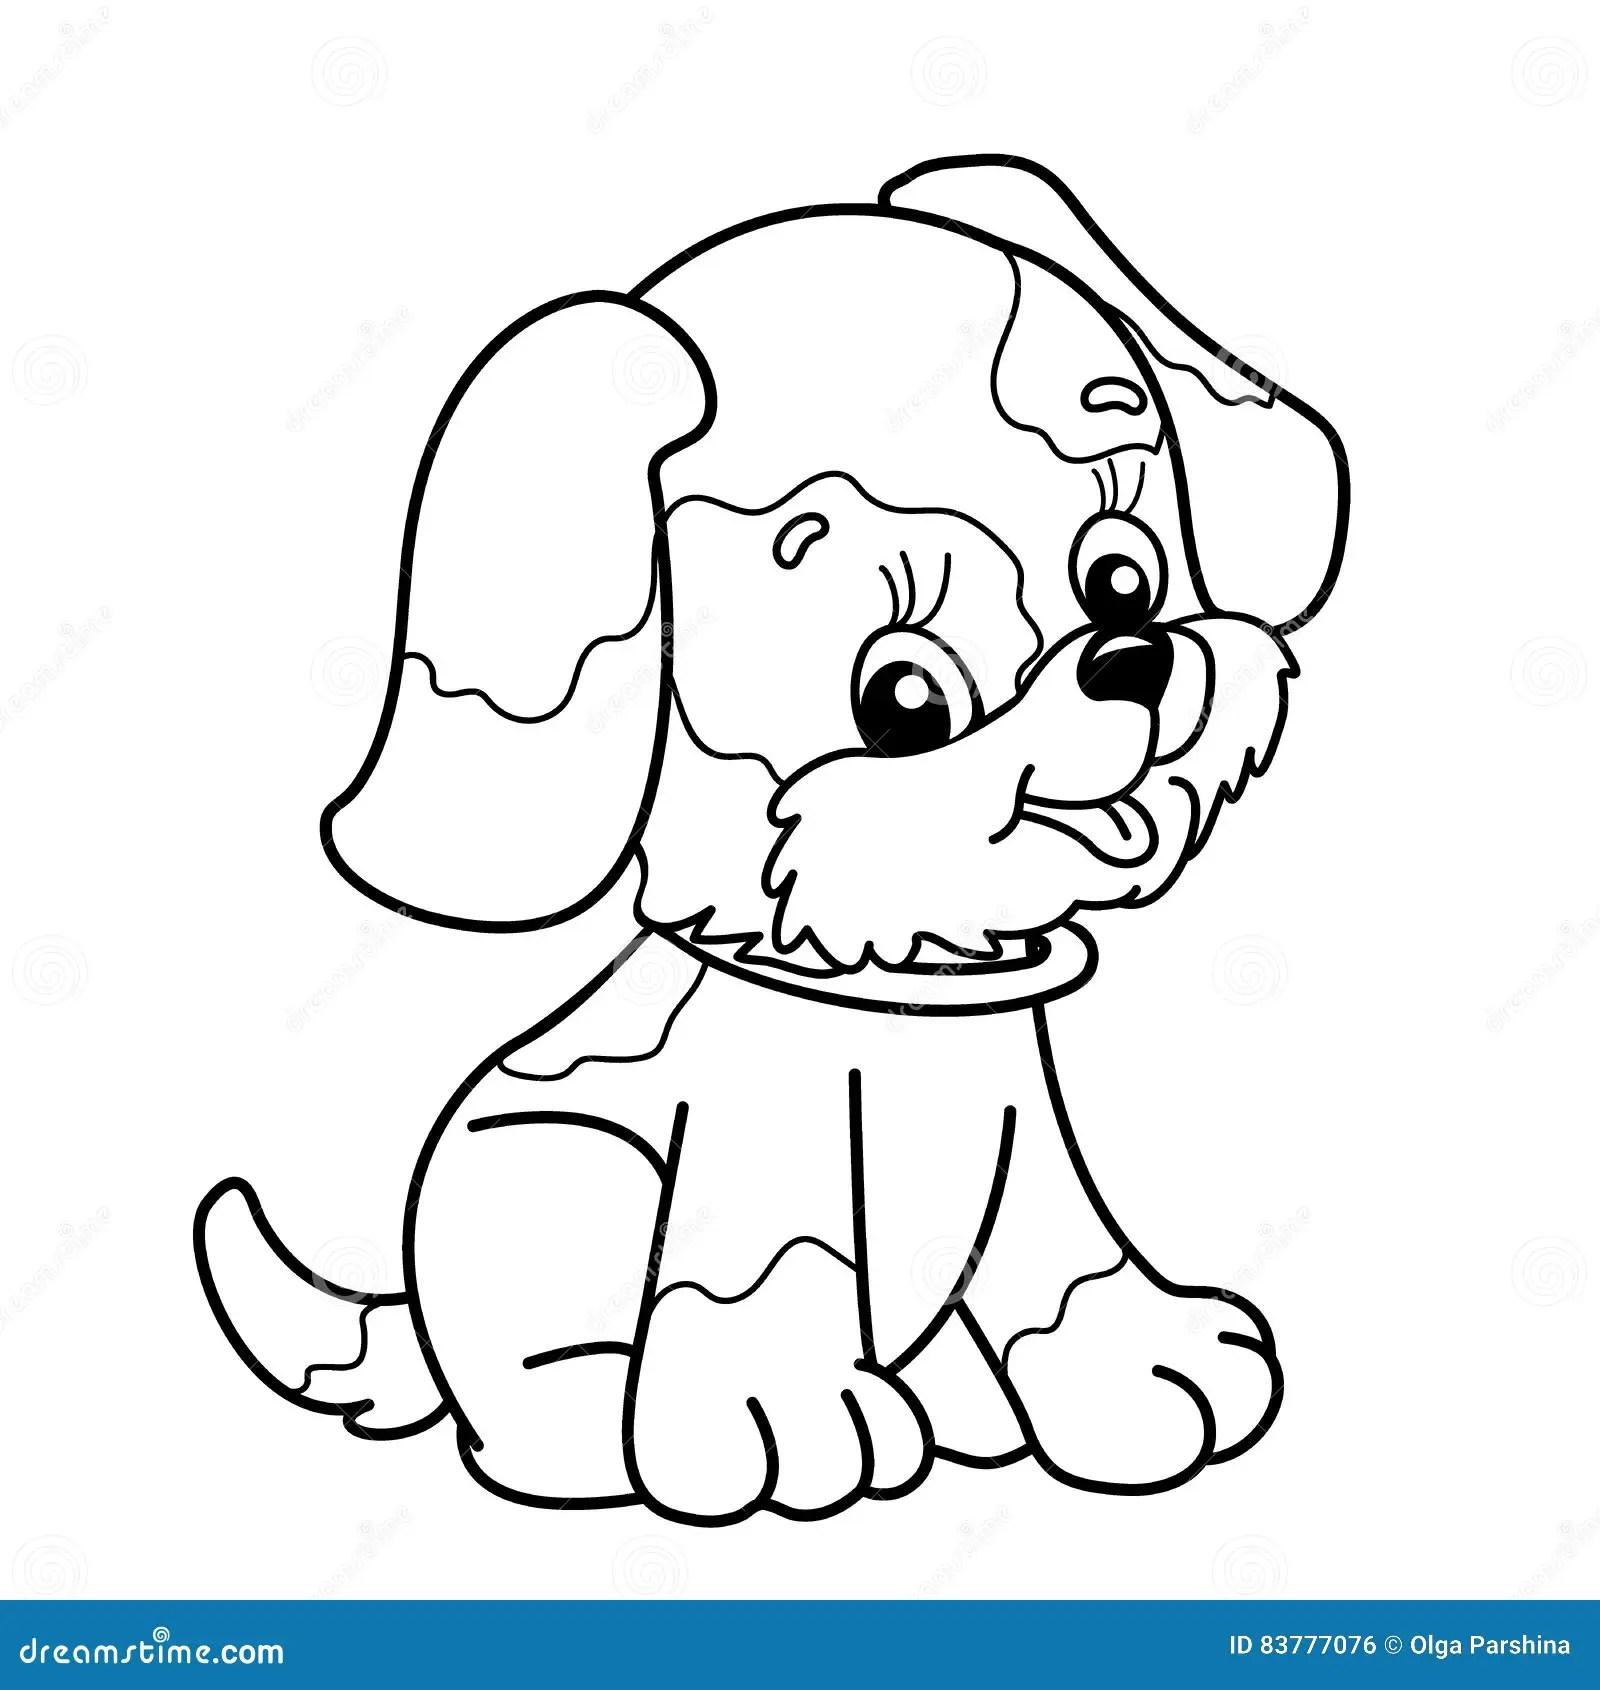 Cute Easy Dogs